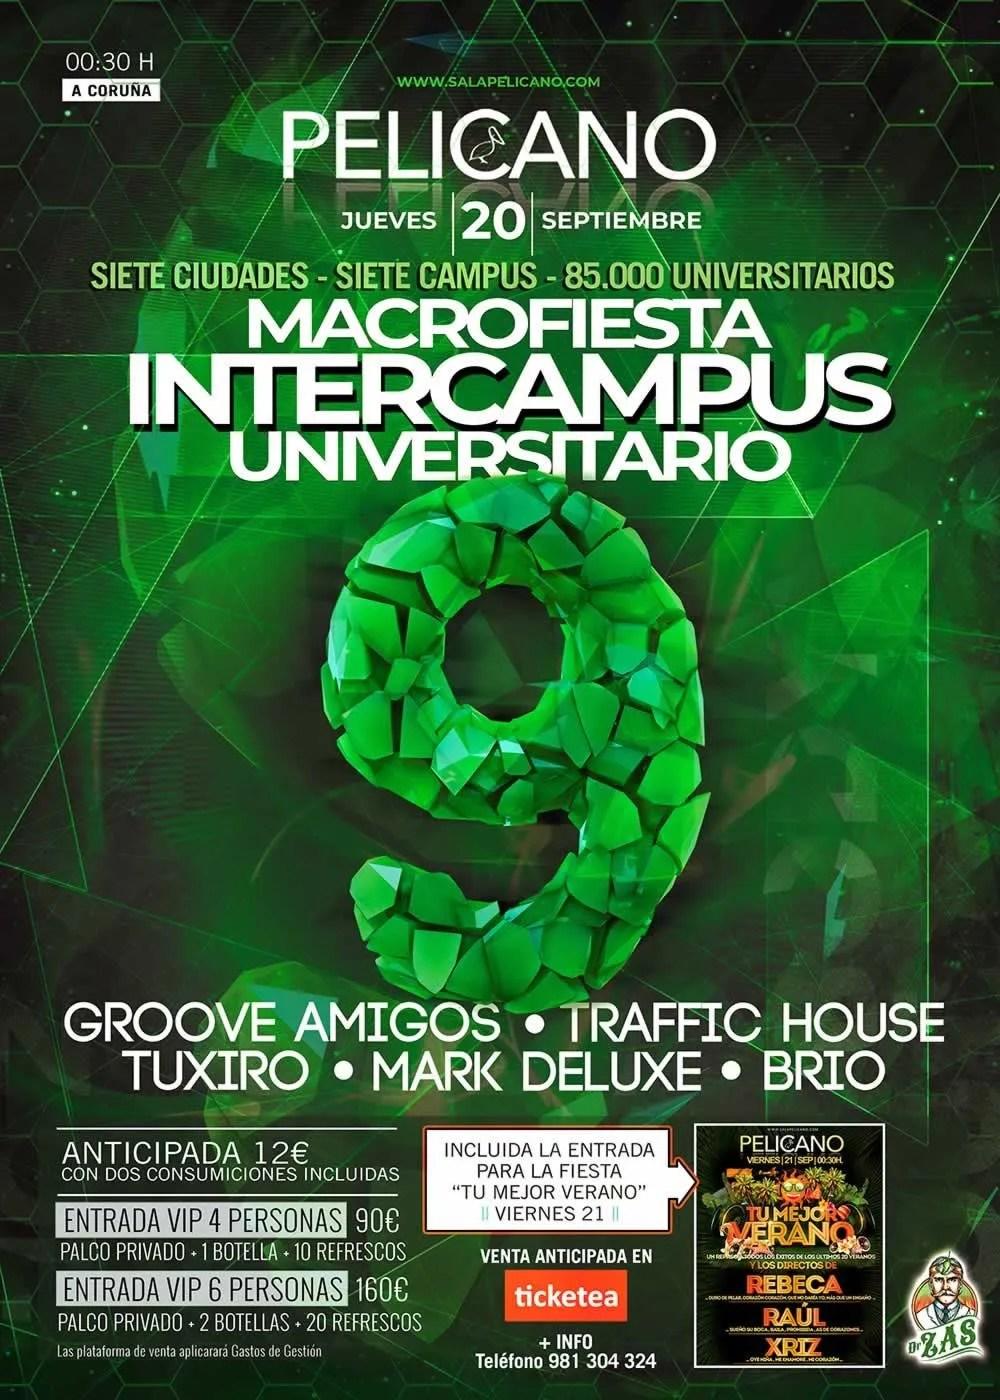 Macrofiesta Intercampus Universitario 9